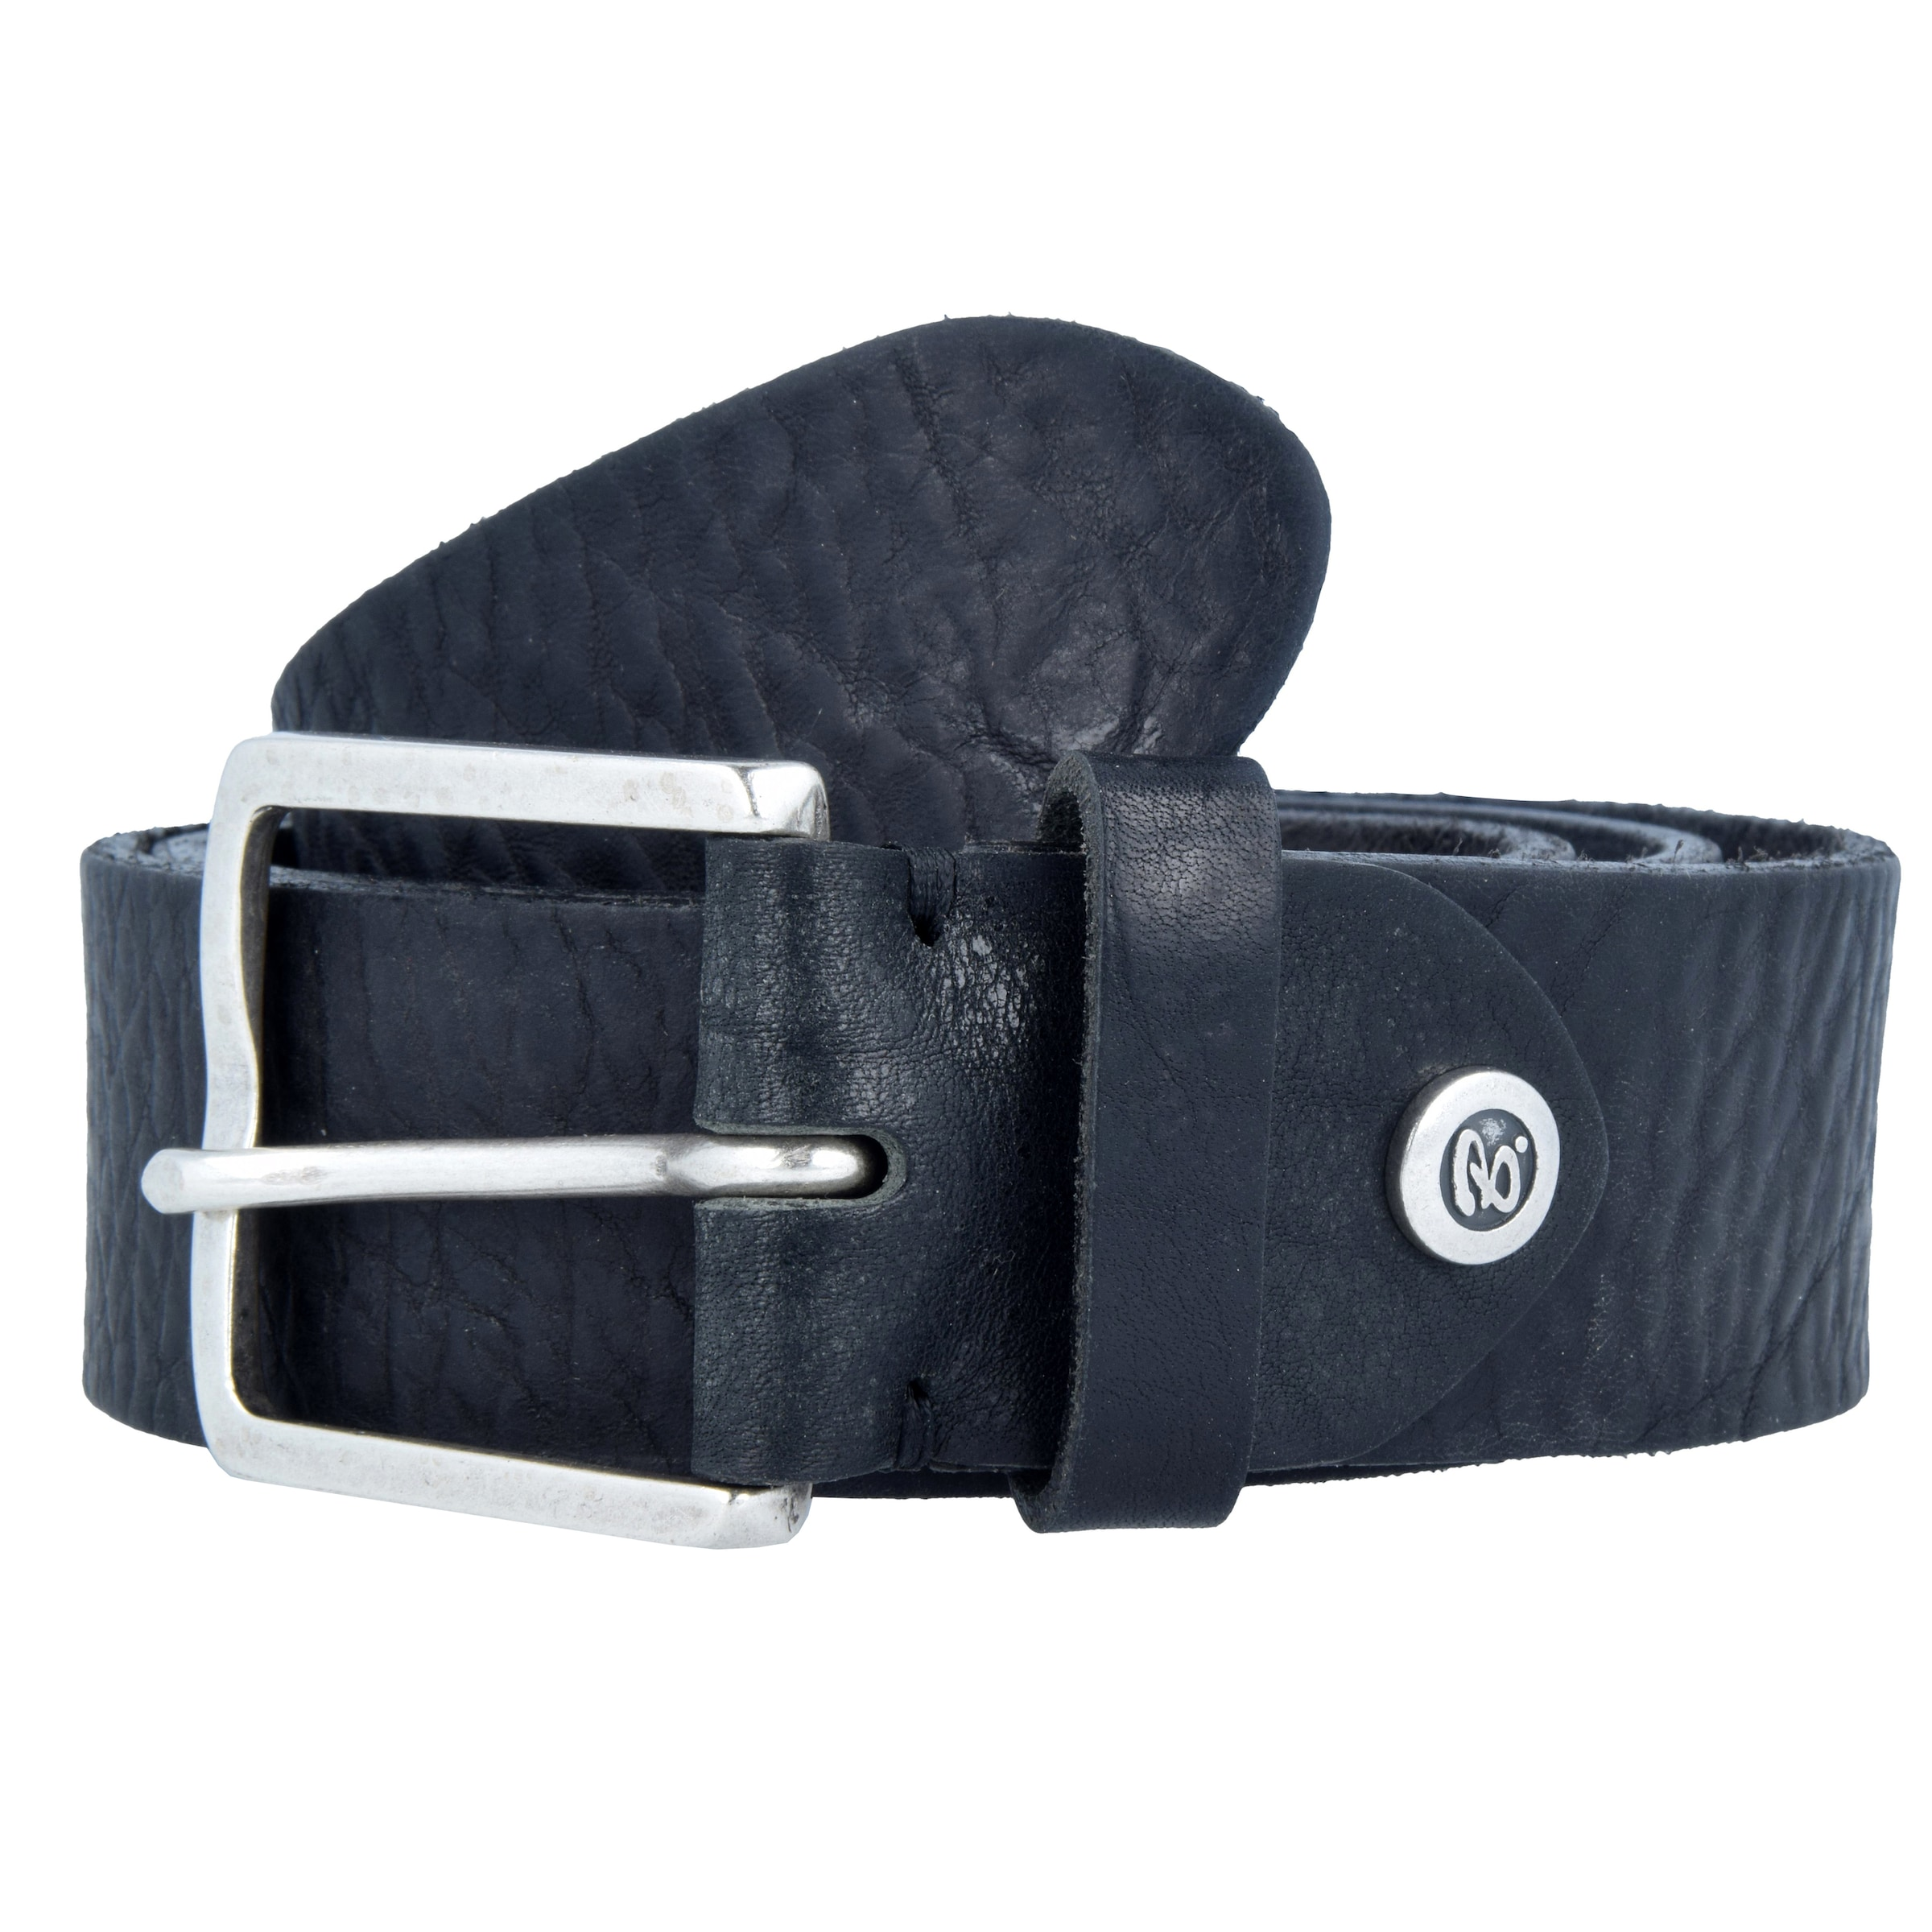 Handmade Gürtel B belt Germany In Schwarz HEIYeDW29